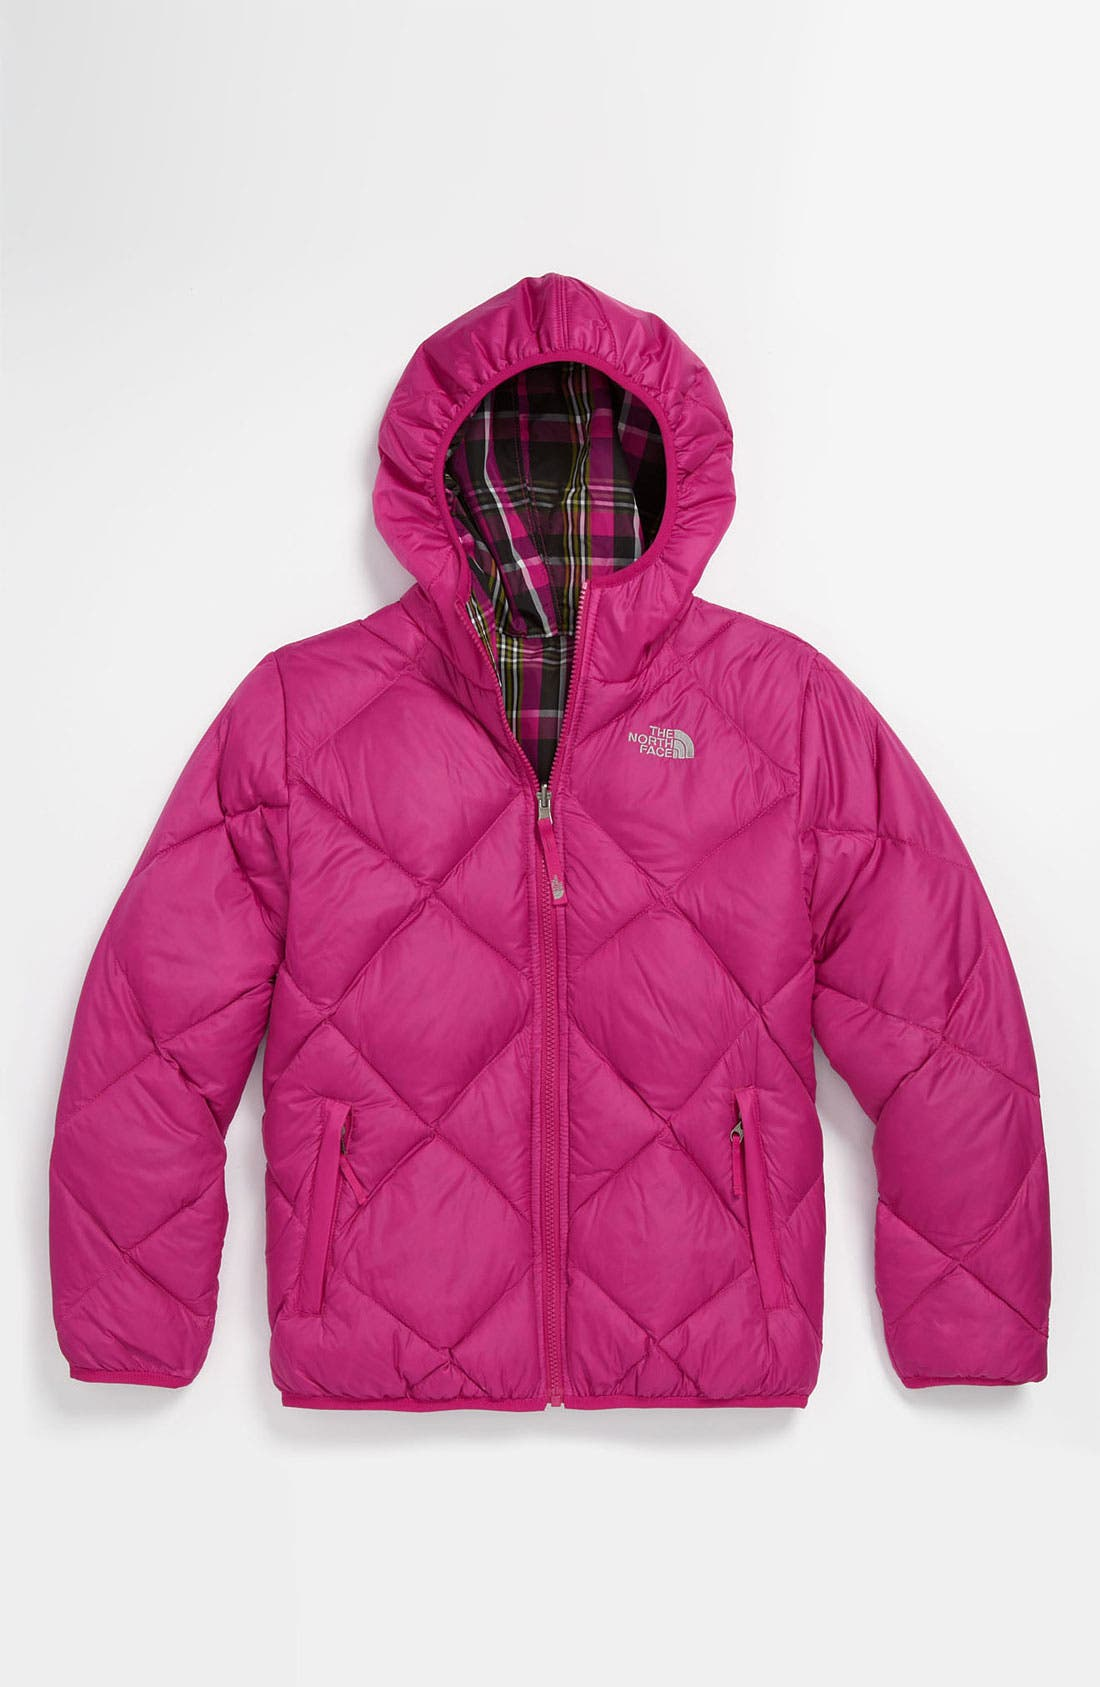 Main Image - The North Face 'Moondoggy' Jacket (Big Girls)